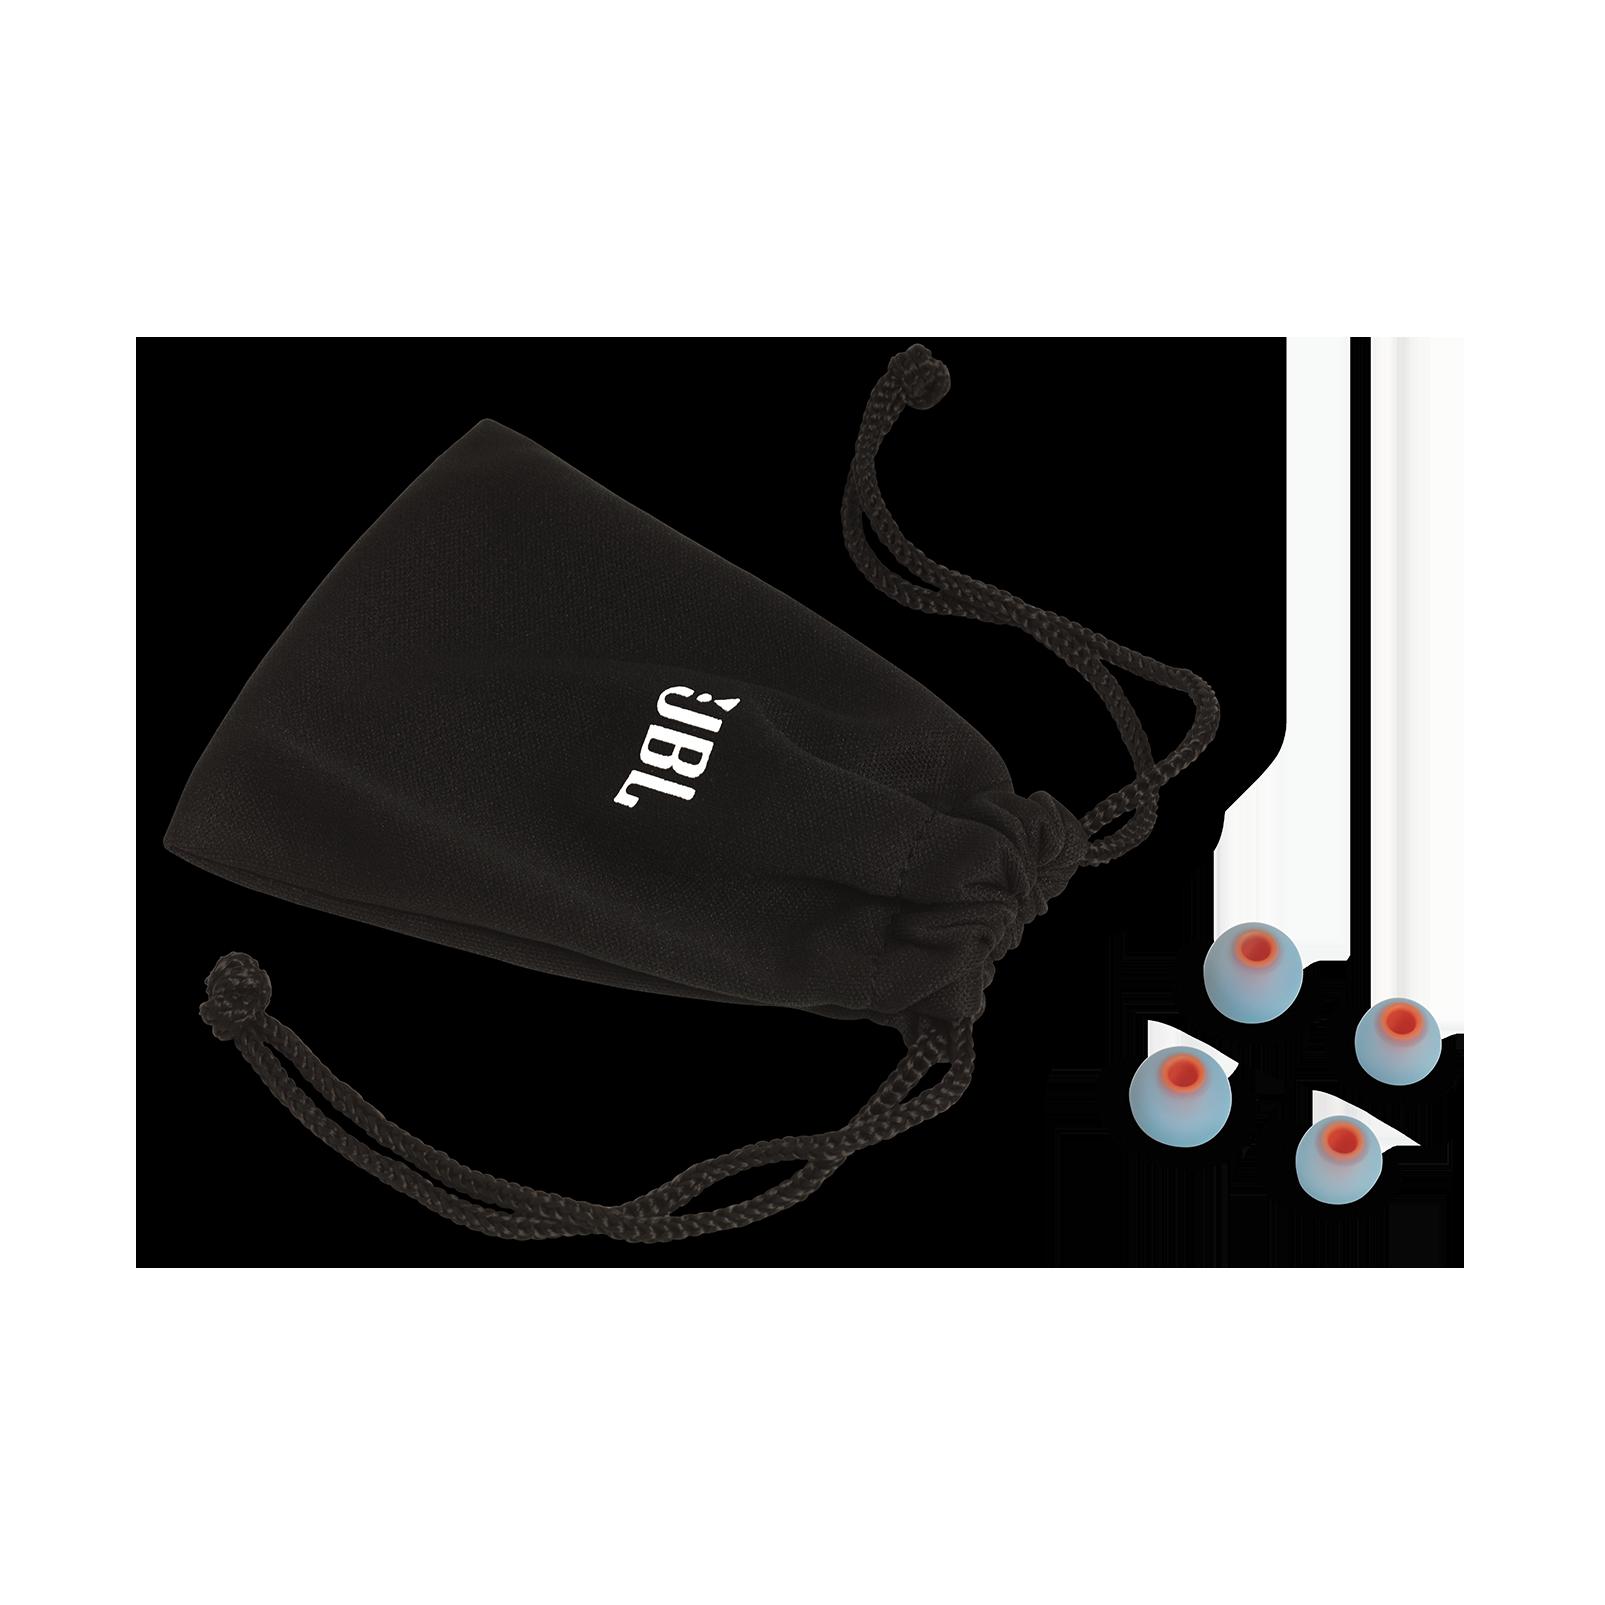 JBL TUNE 210 - Grey - In-ear headphones - Detailshot 5